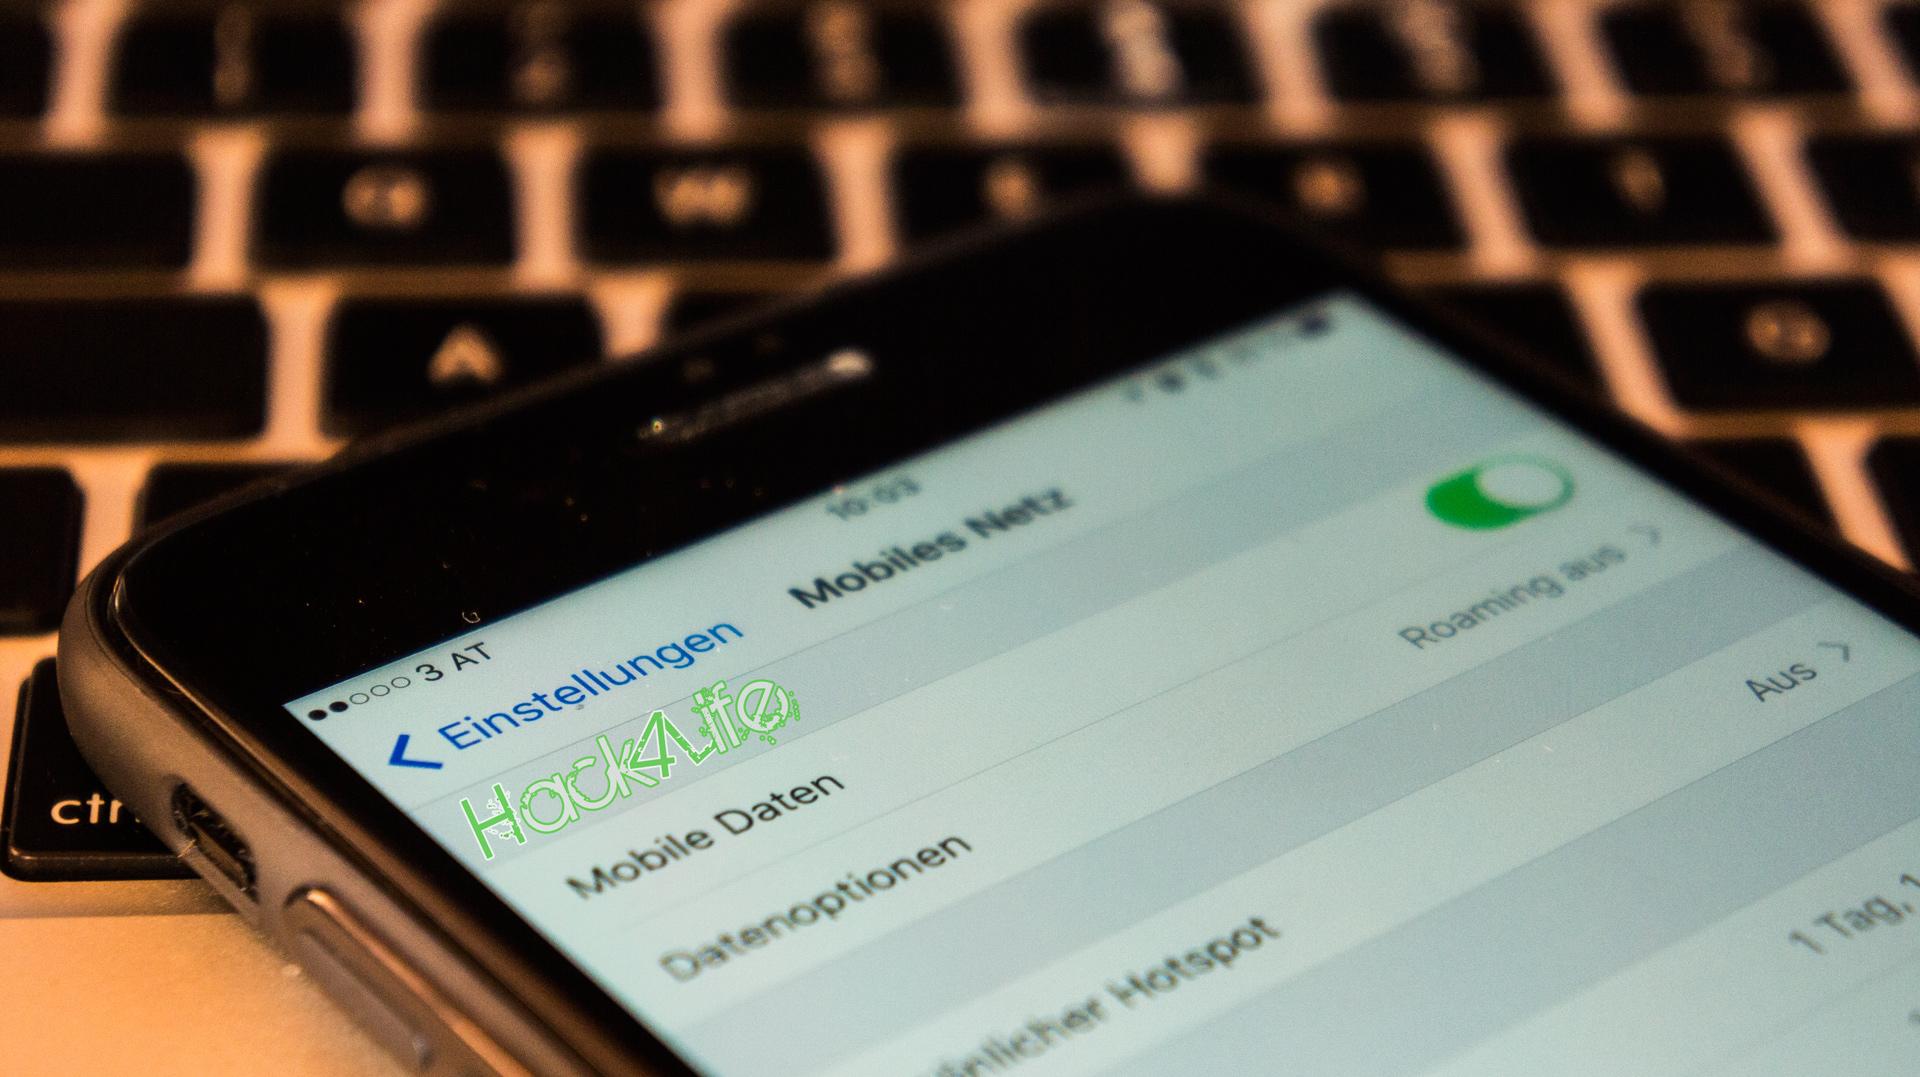 Iphone Neuestes Update